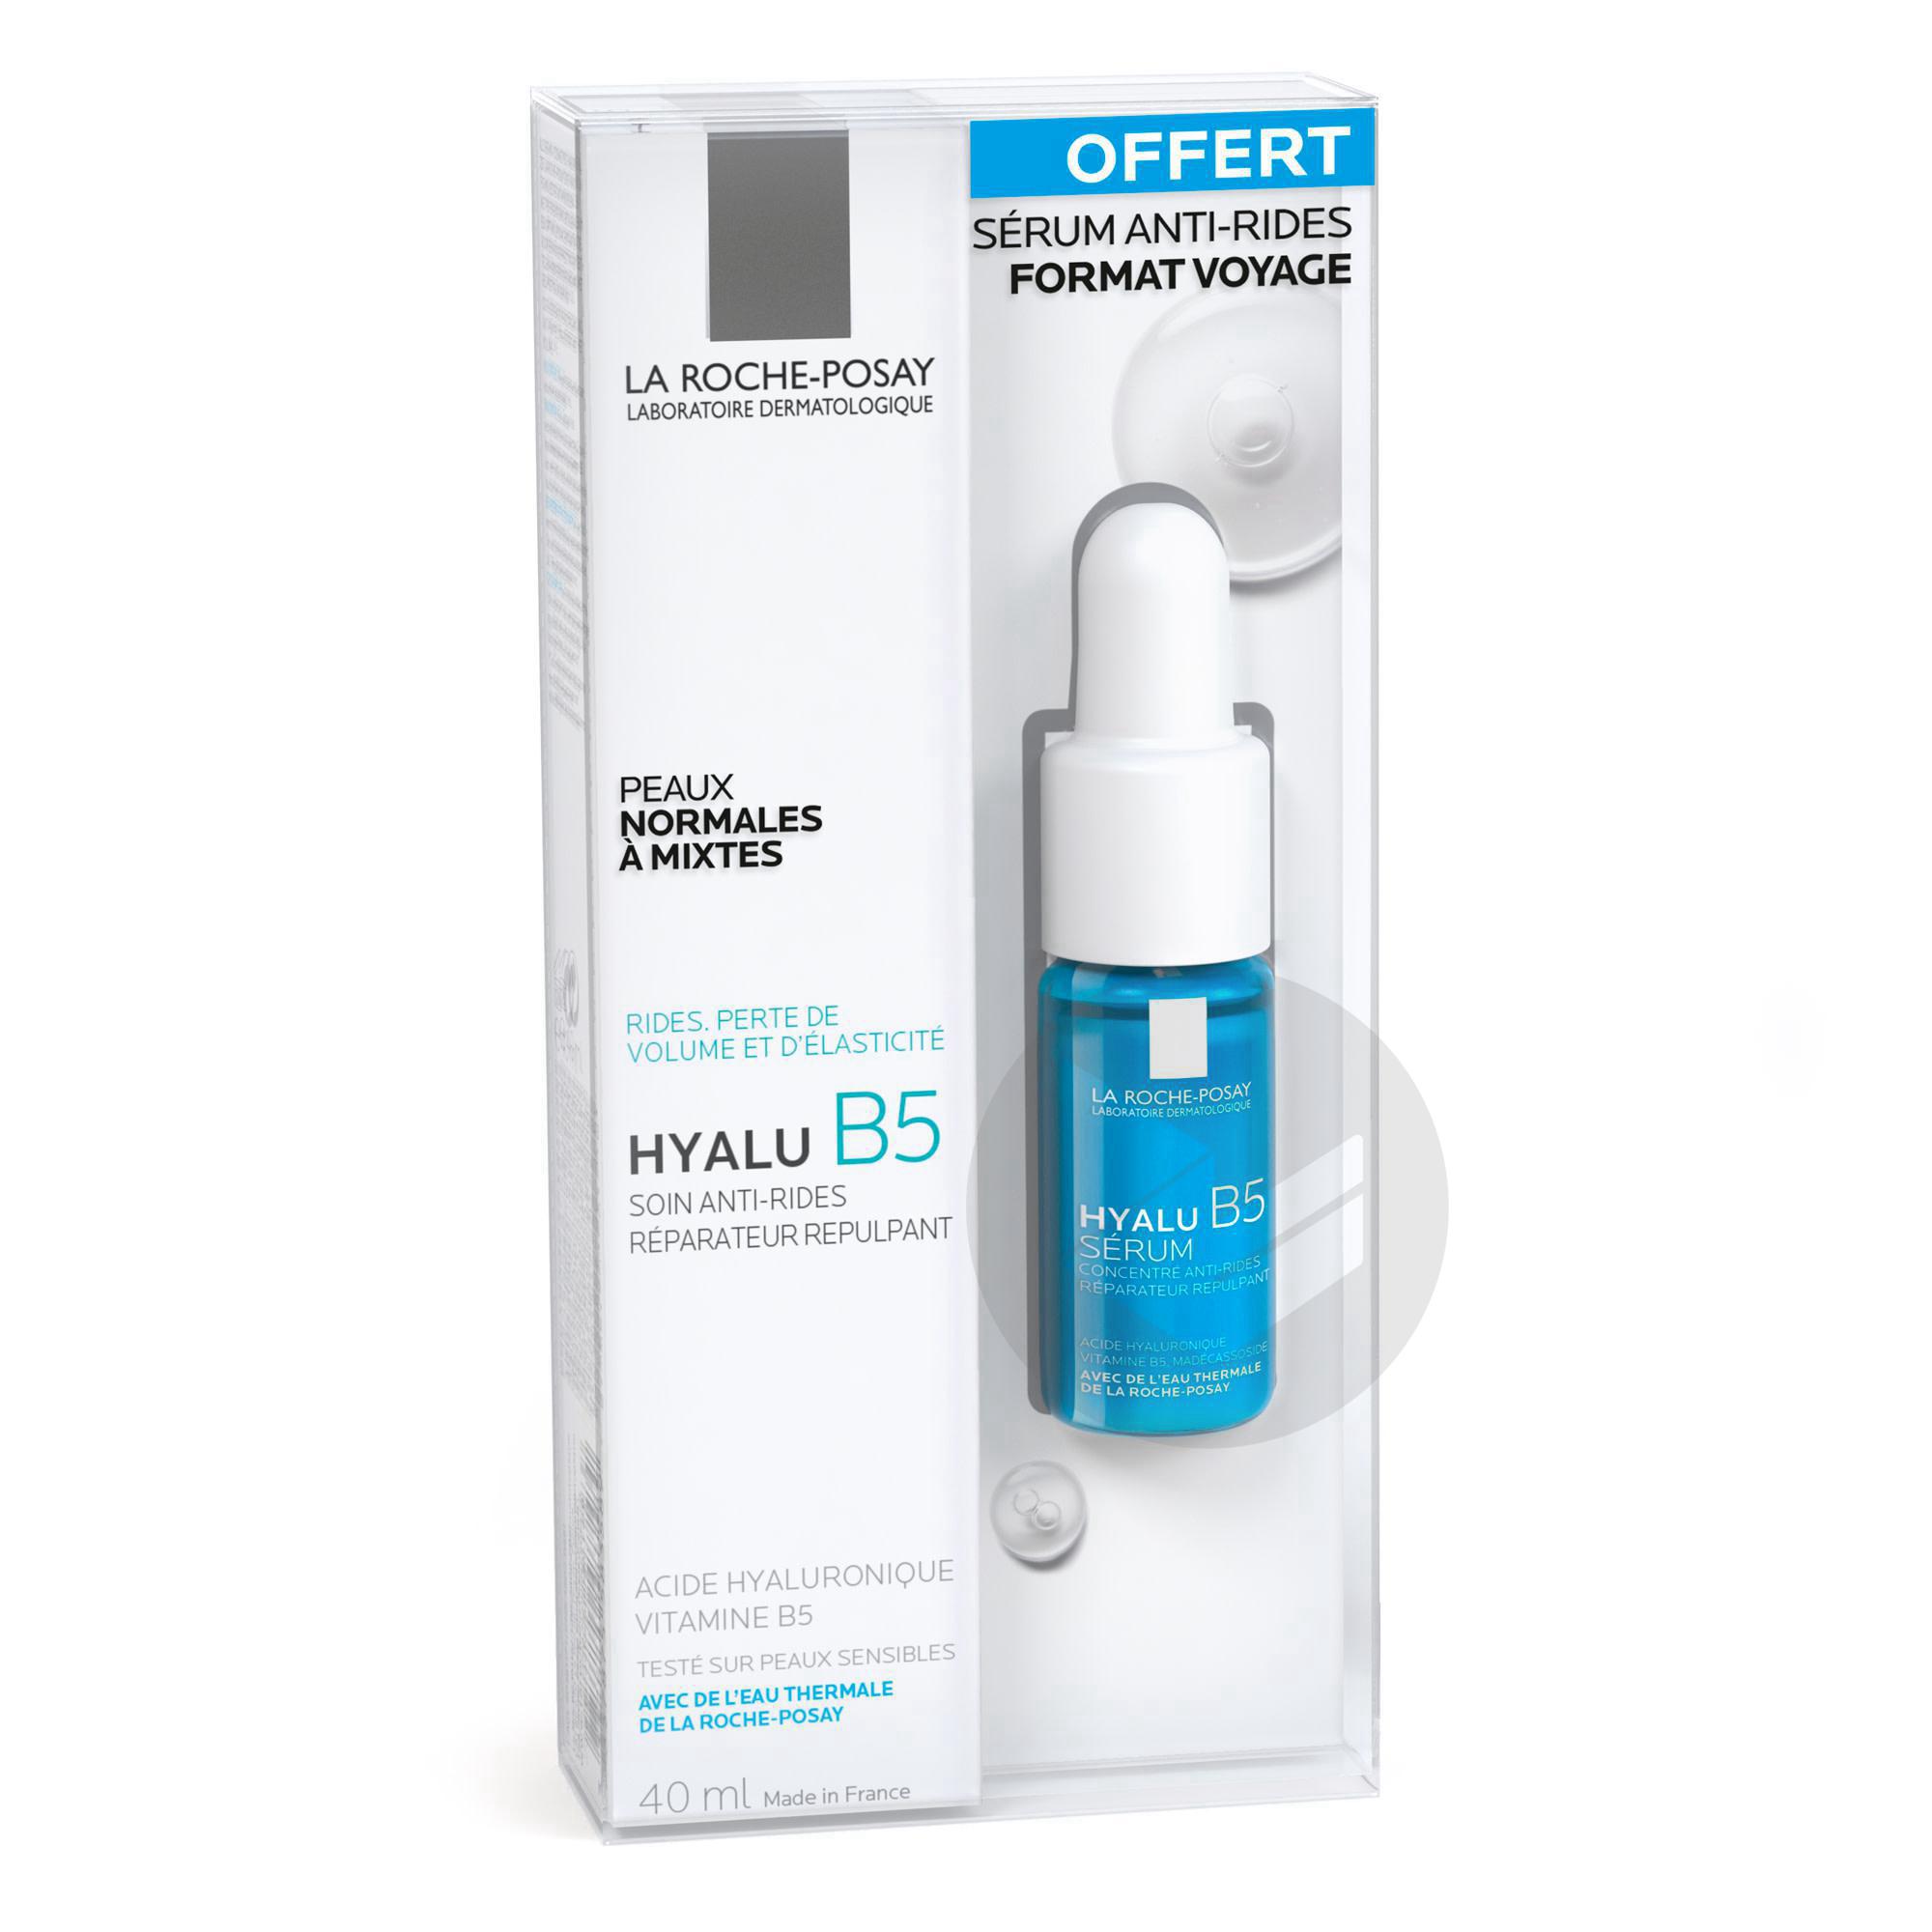 Hyalu B 5 Coffret Soin Mini Serum 10 Ml Offert